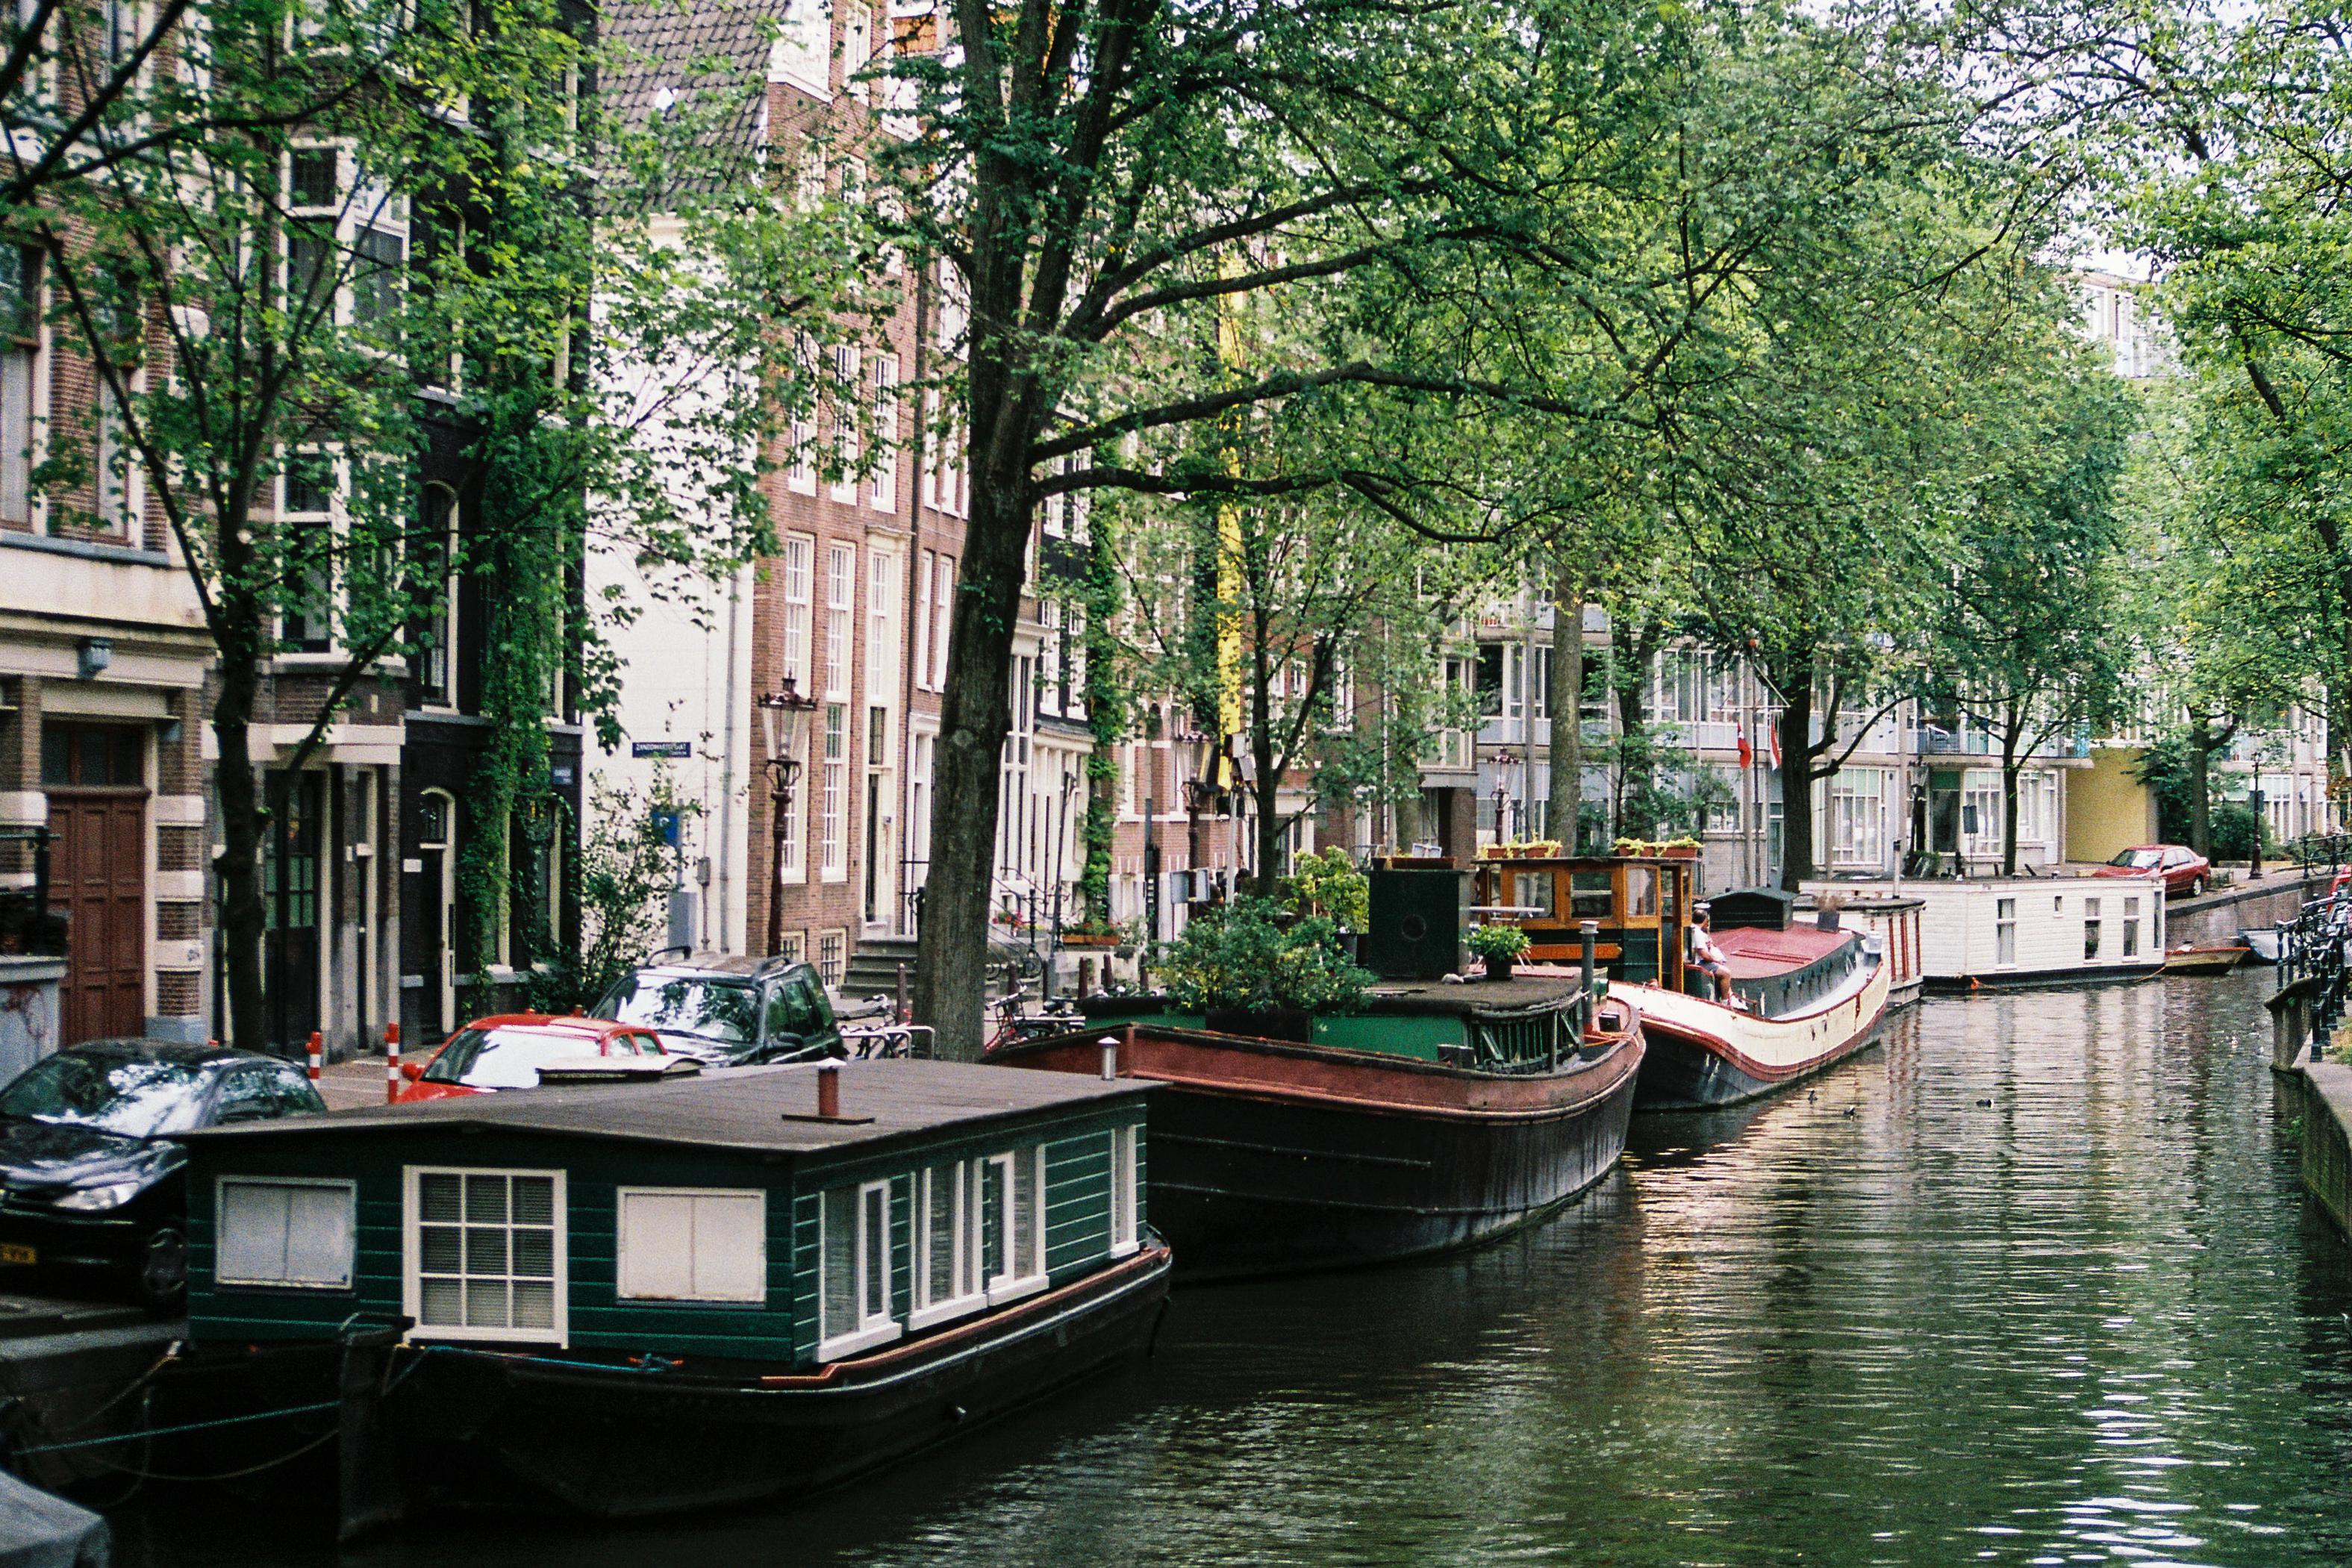 Mooring, Amsterdam, Netherlands, Europe